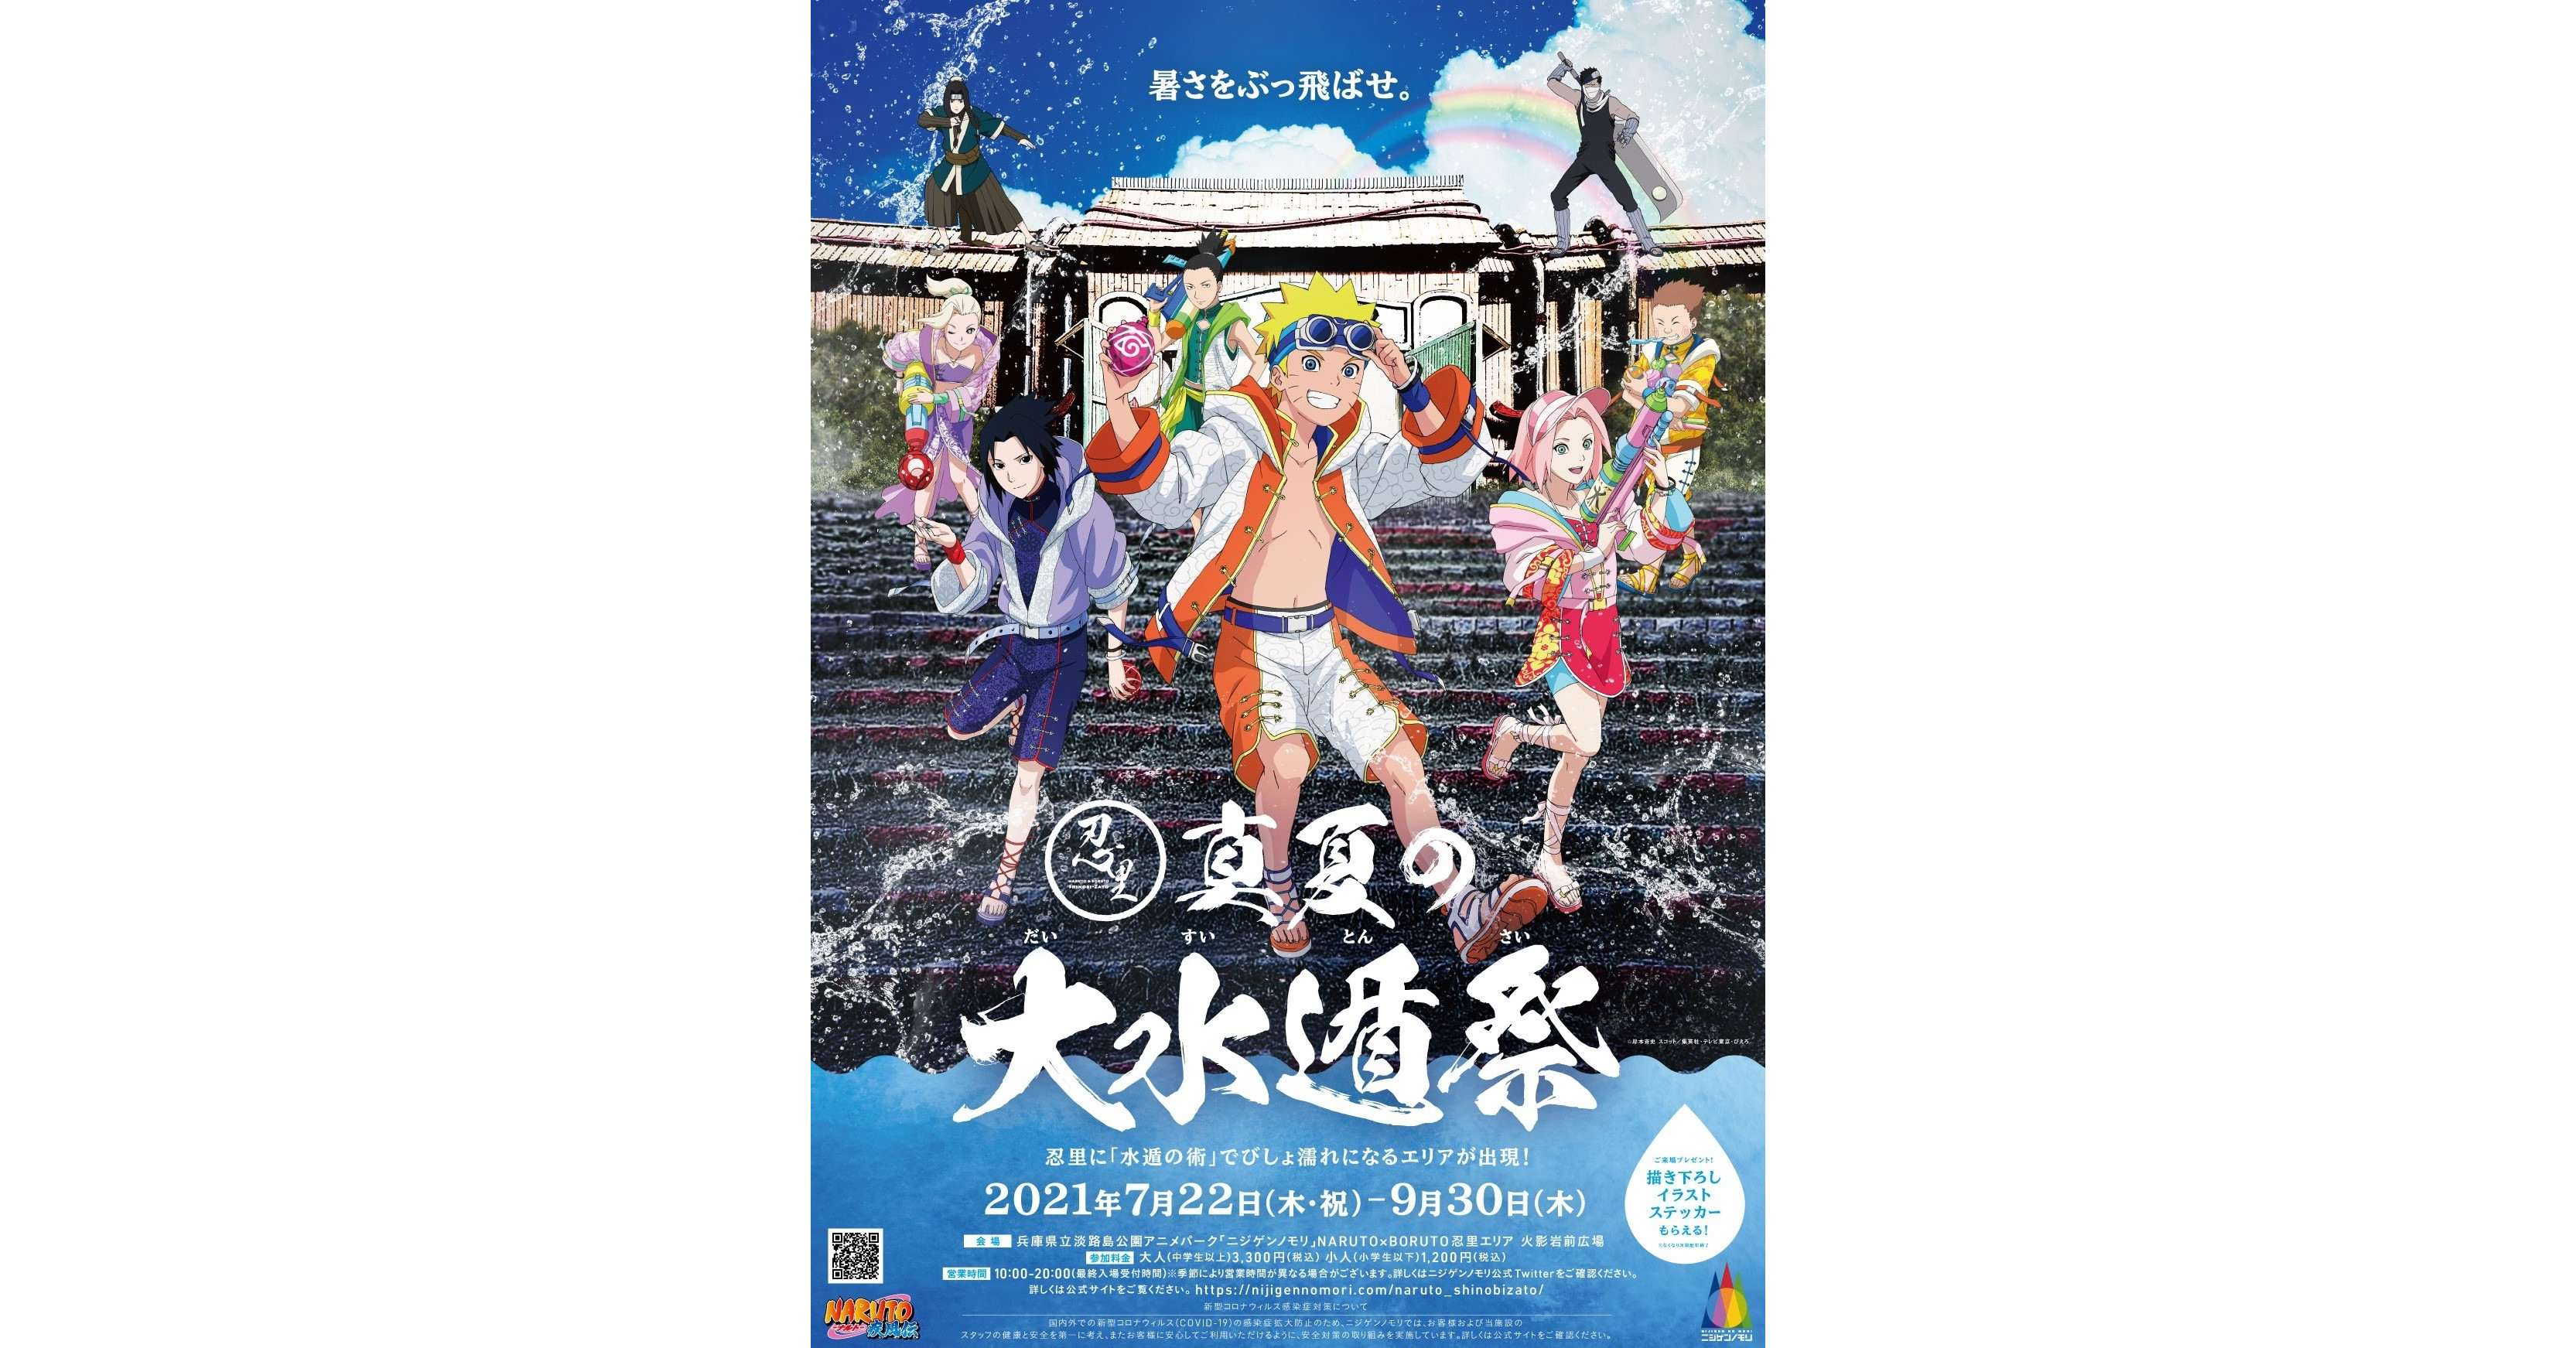 「NARUTO&BORUTO 忍里」 『忍里・真夏の大水遁祭』1